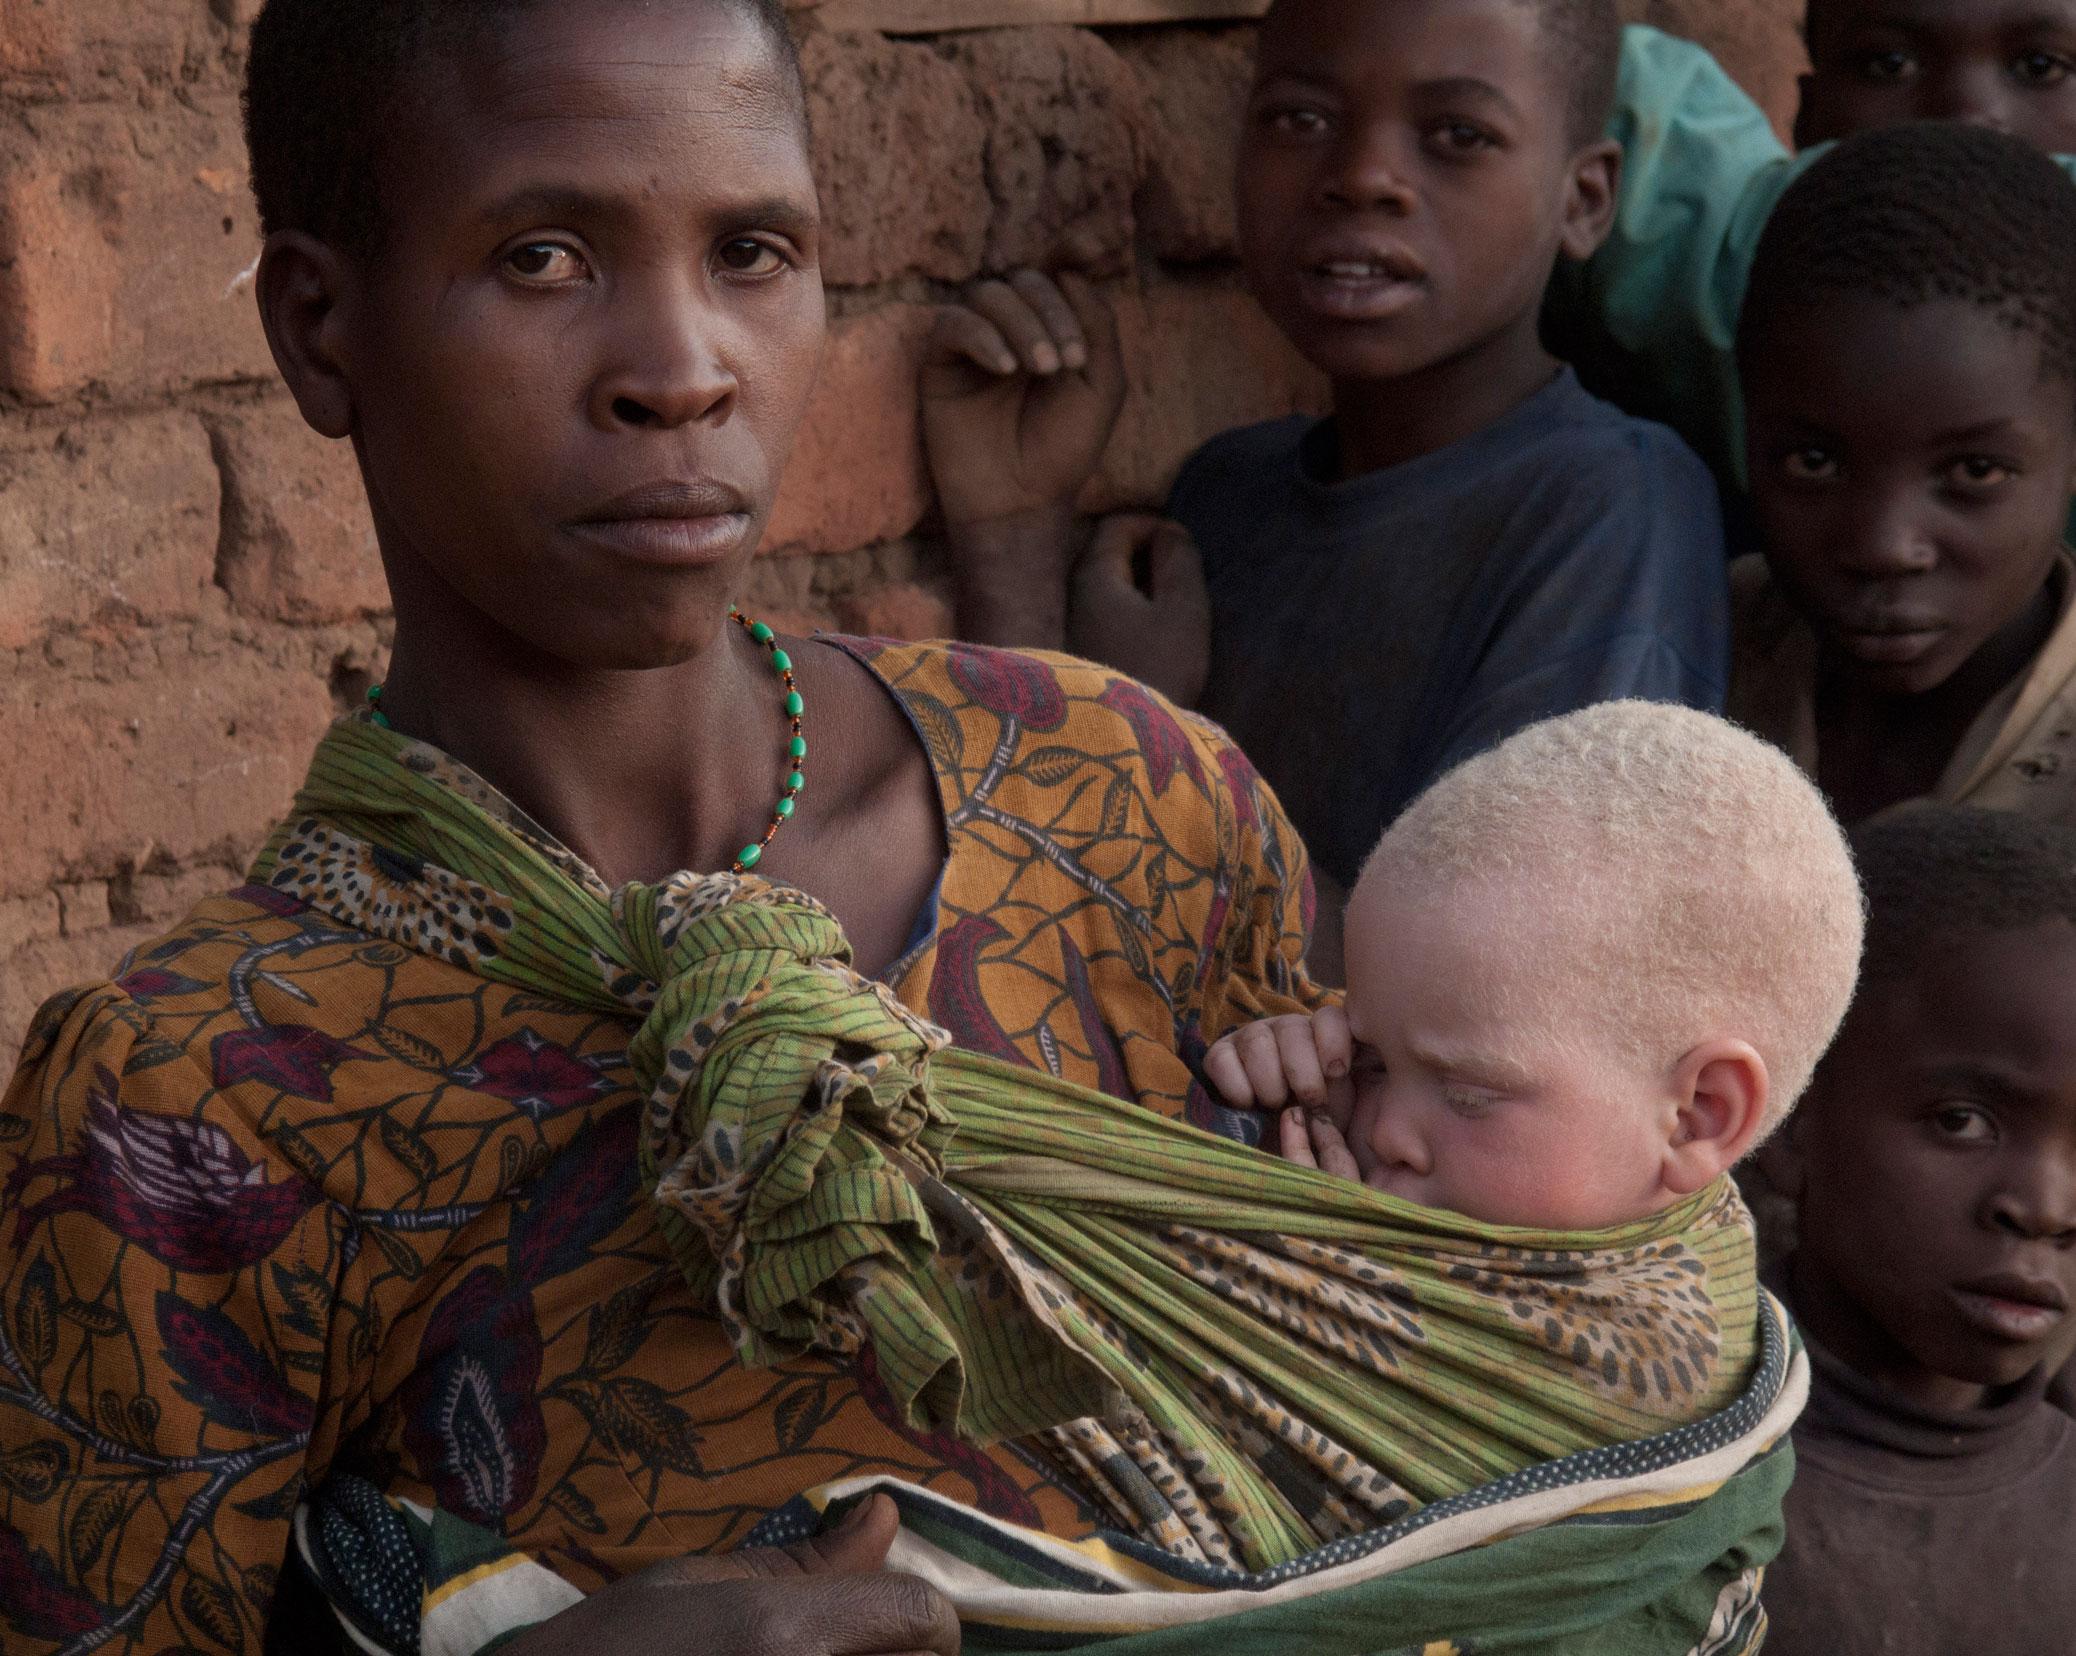 фото альбиносов африканцев назначил своим